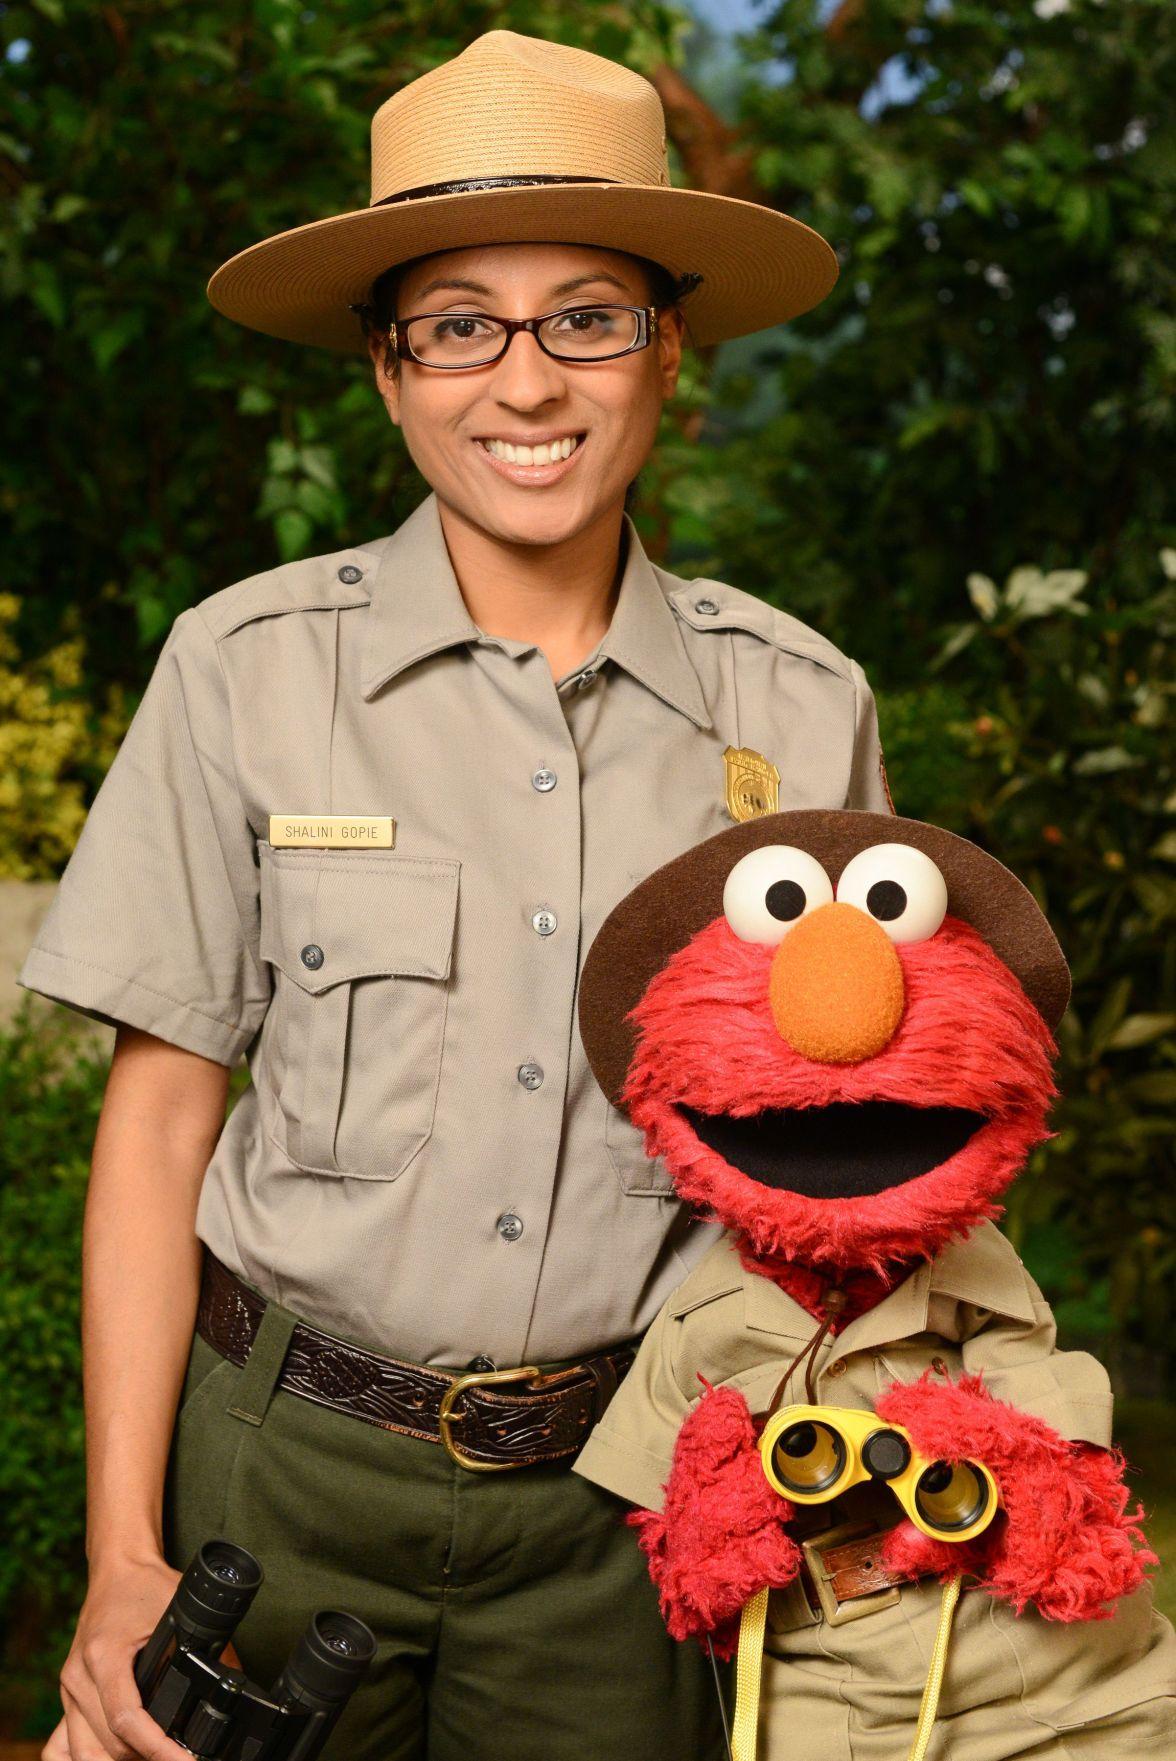 Sesame project urges kids to visit parks, get outdoors